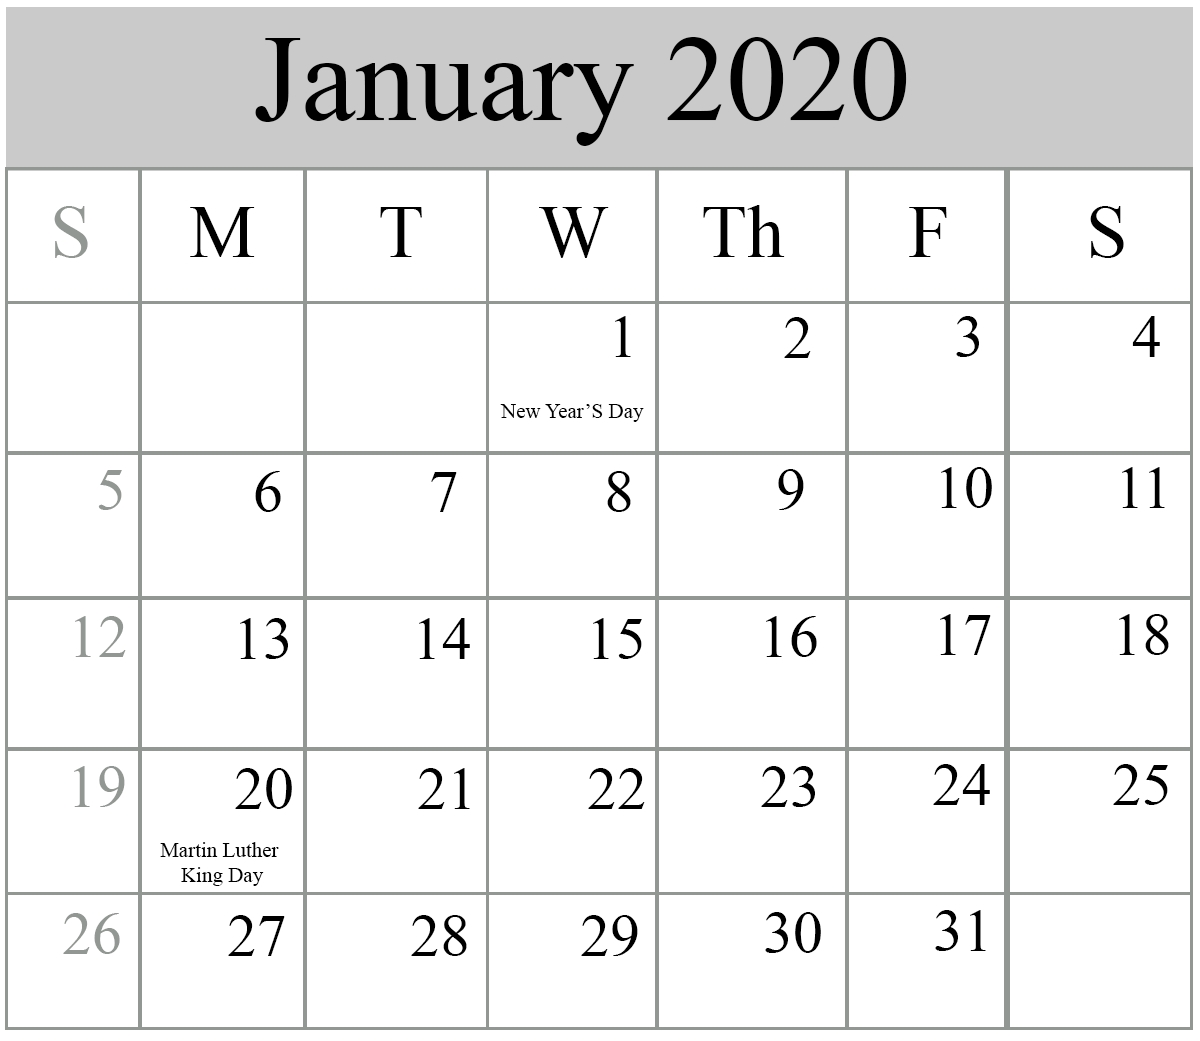 Free Blank January 2020 Calendar Printable In Pdf, Word-January 2020 Calendar Festivals